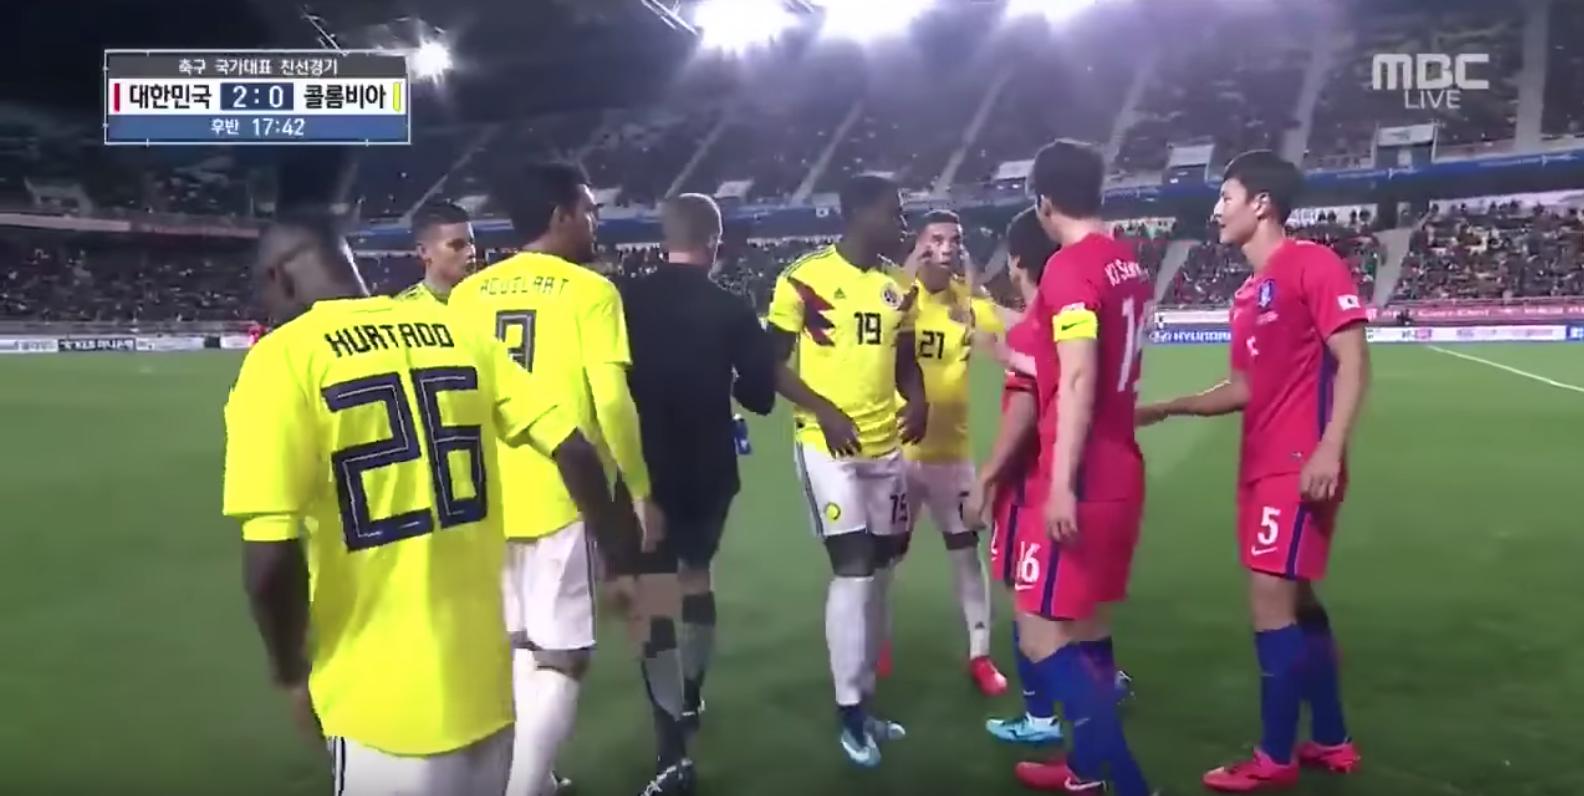 Watch: Colombia's Edwin Cardona Makes Racist Slant-Eye Gesture Against South Korea